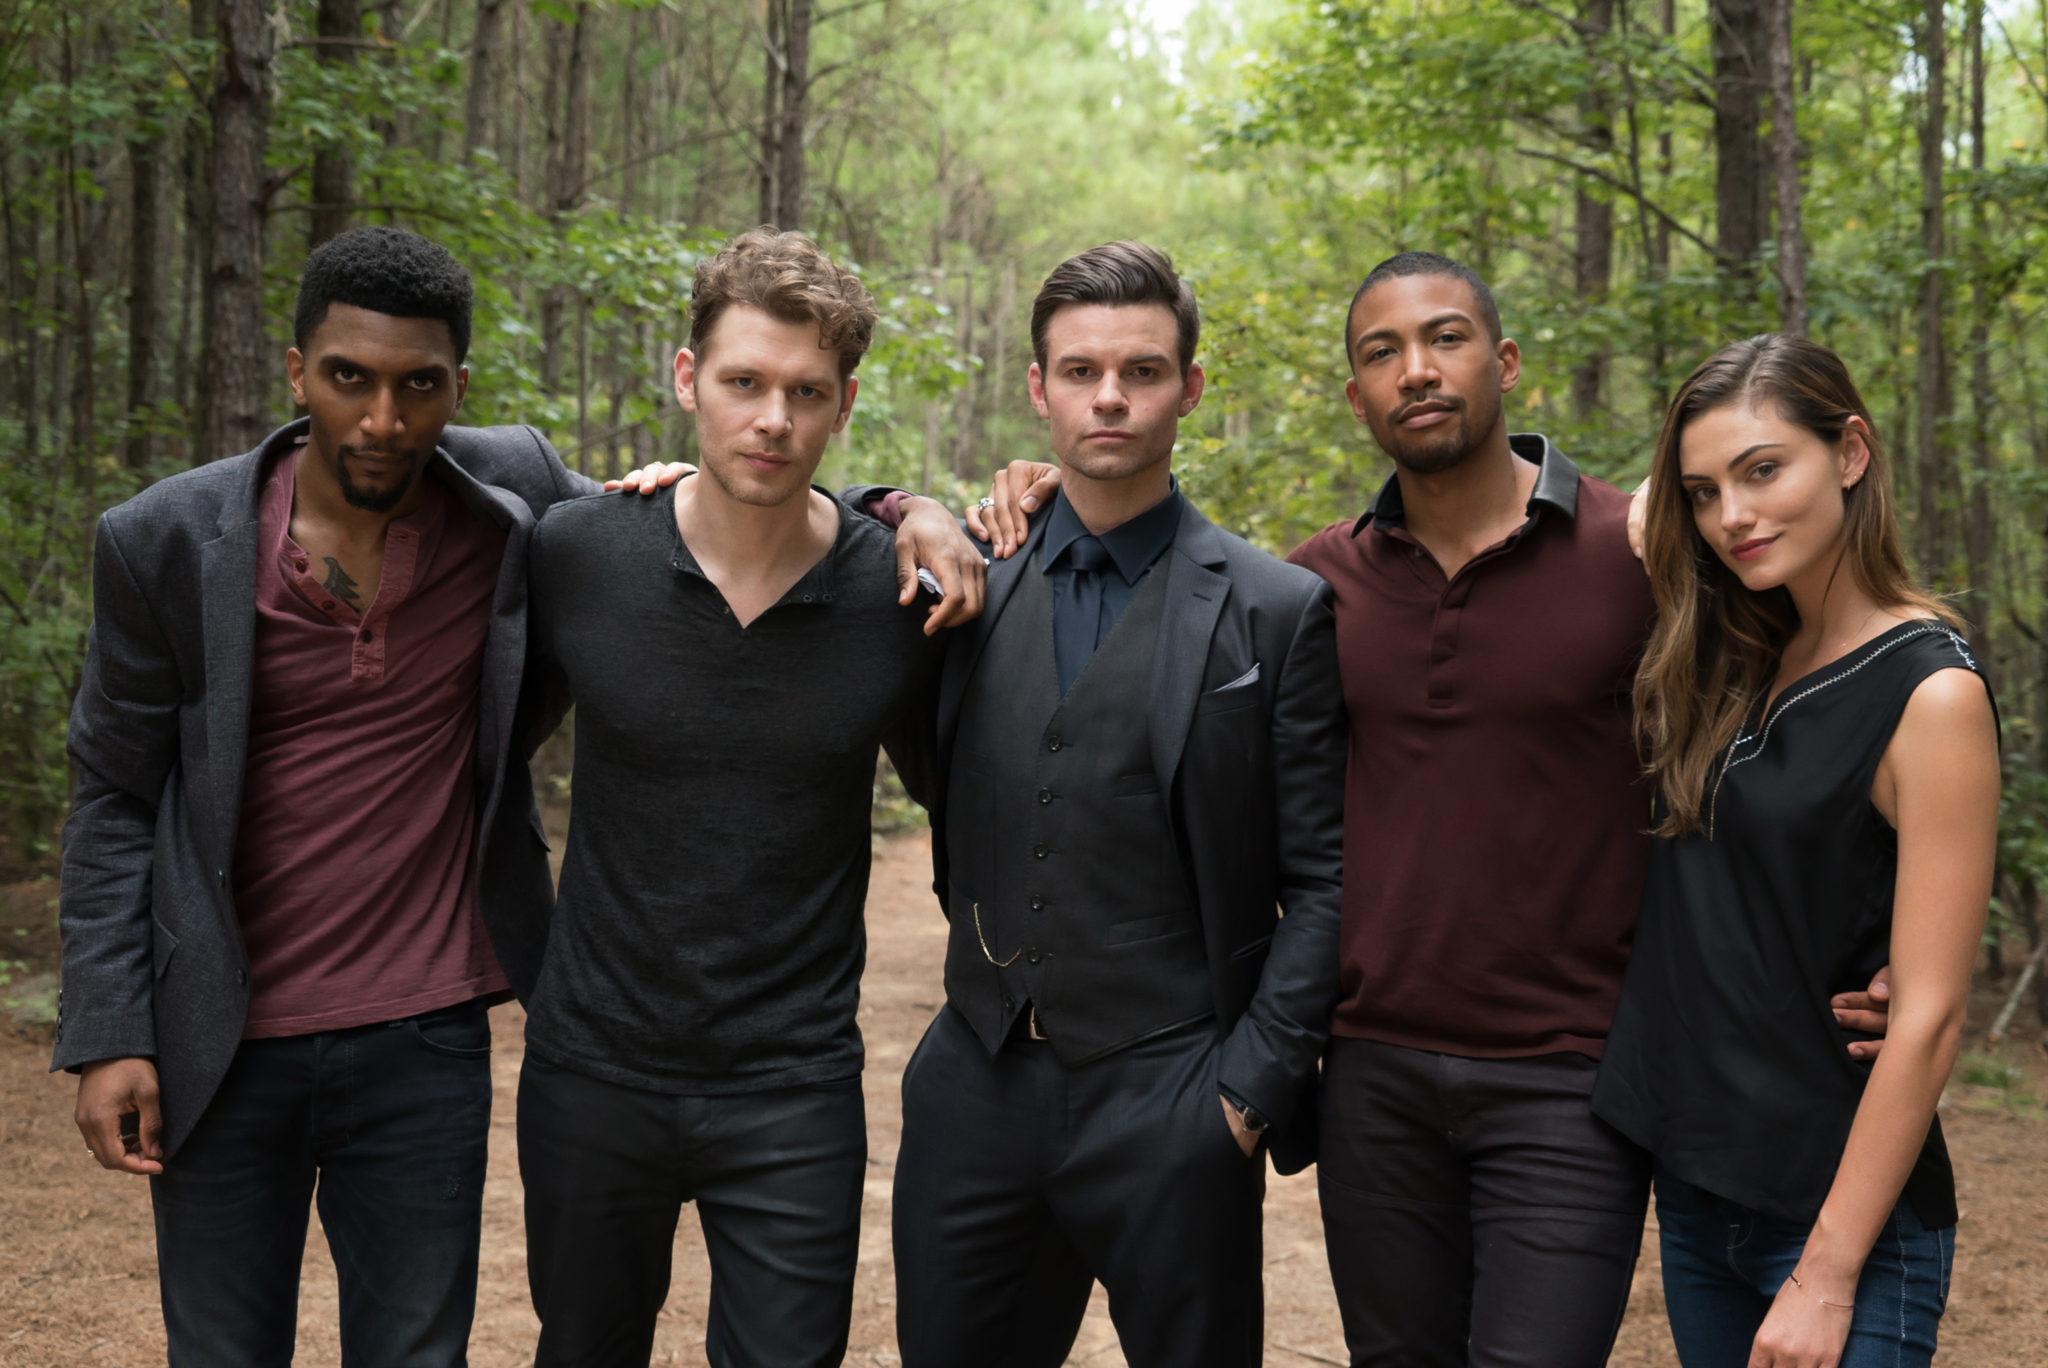 The Originals Returns with a Bang: Season 4, Episodes 1 - 7